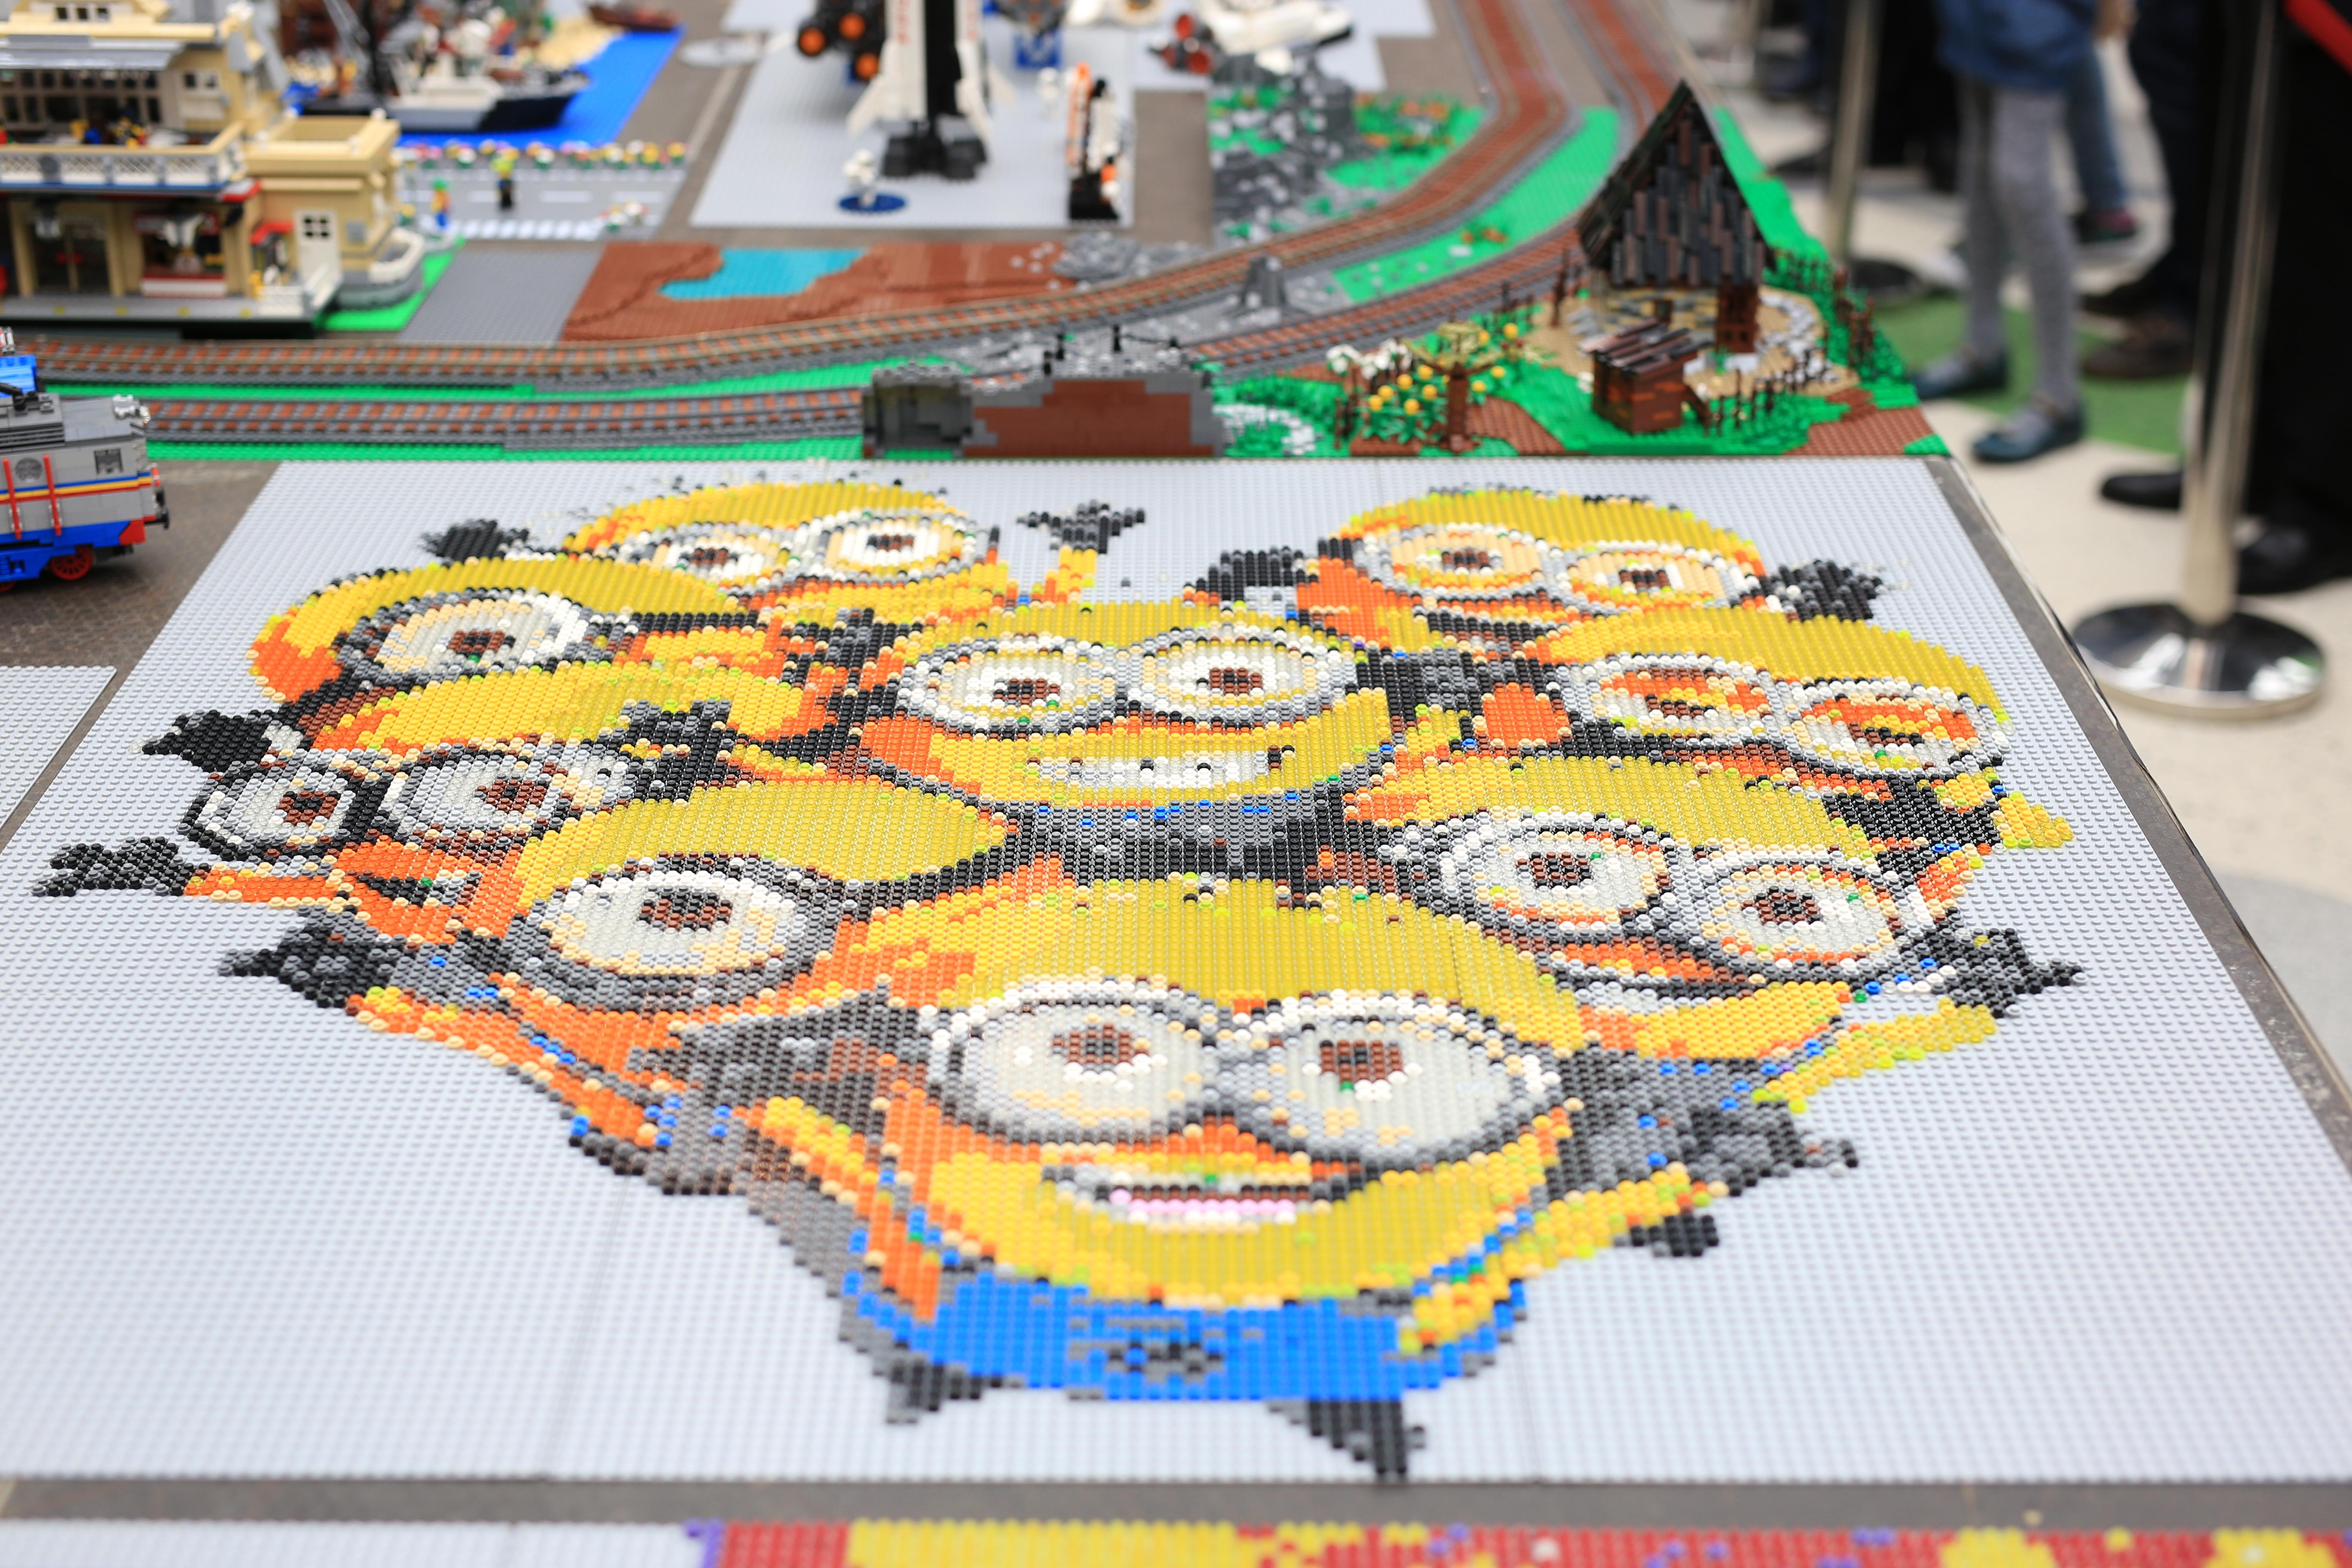 LEGO® MOC by Bricky: Minioni